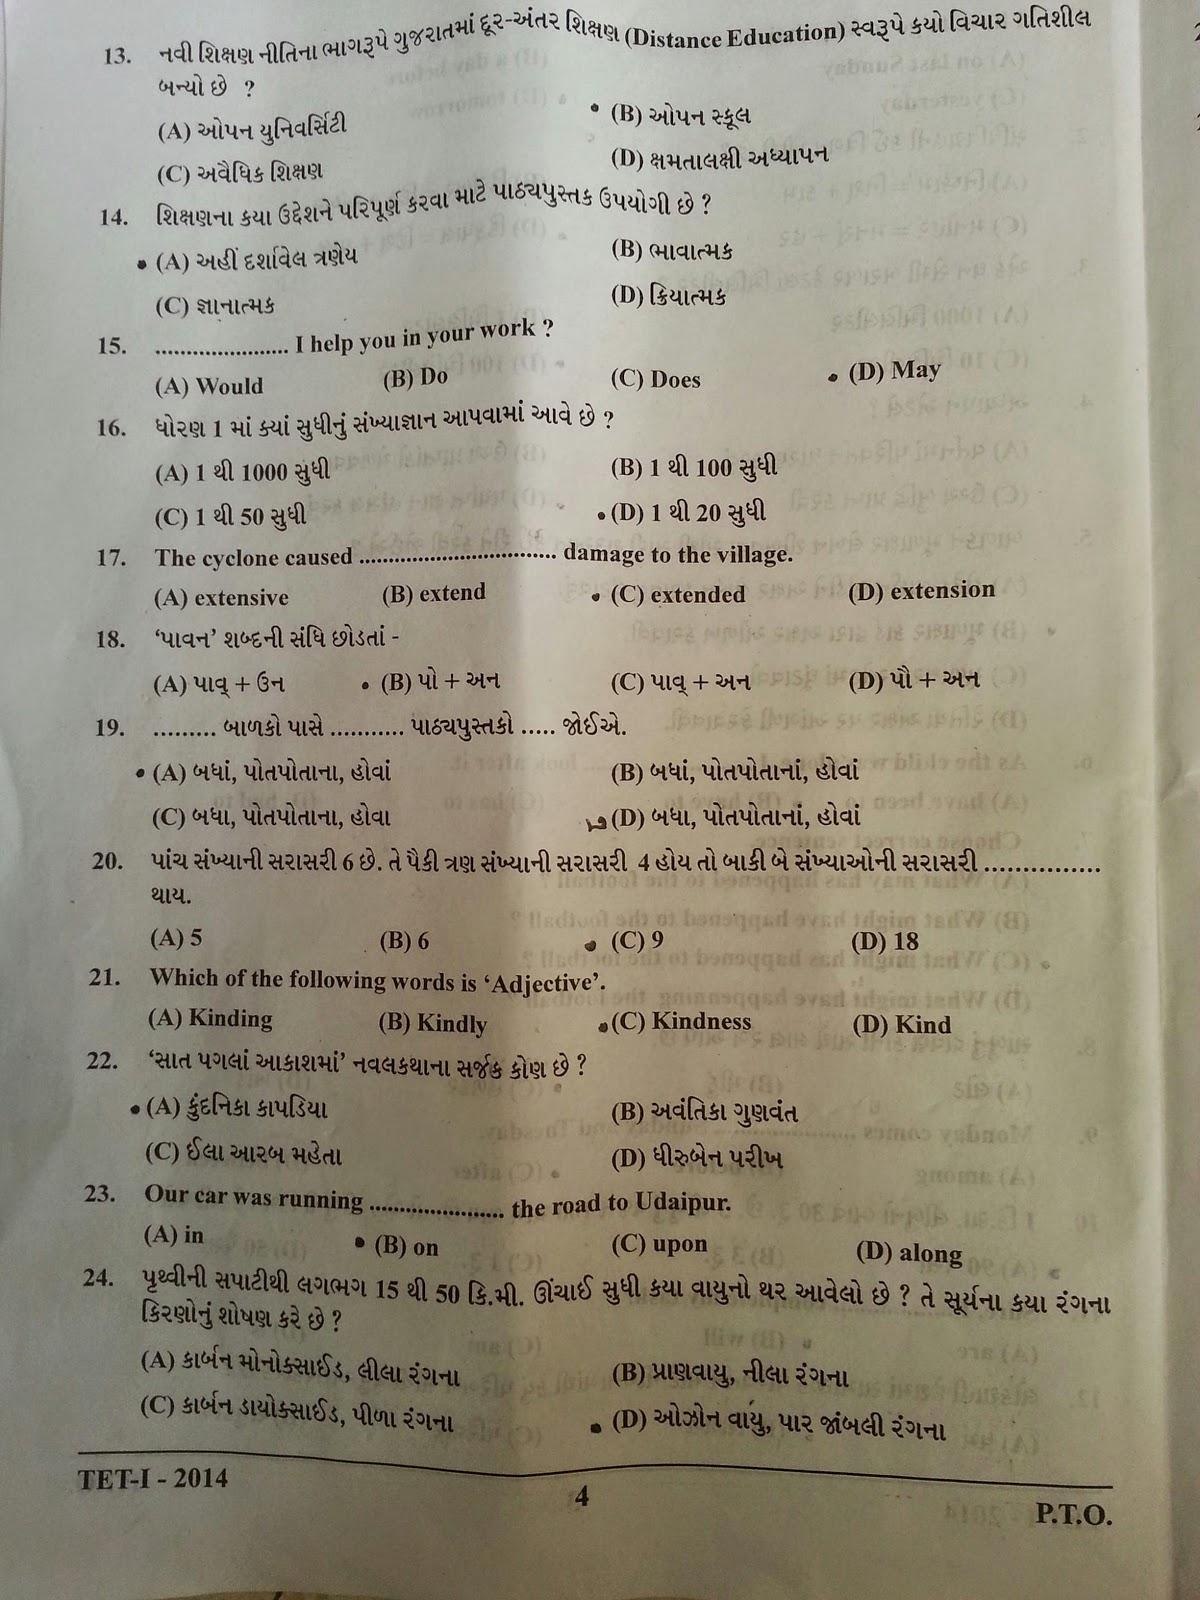 iit question paper 2014 pdf